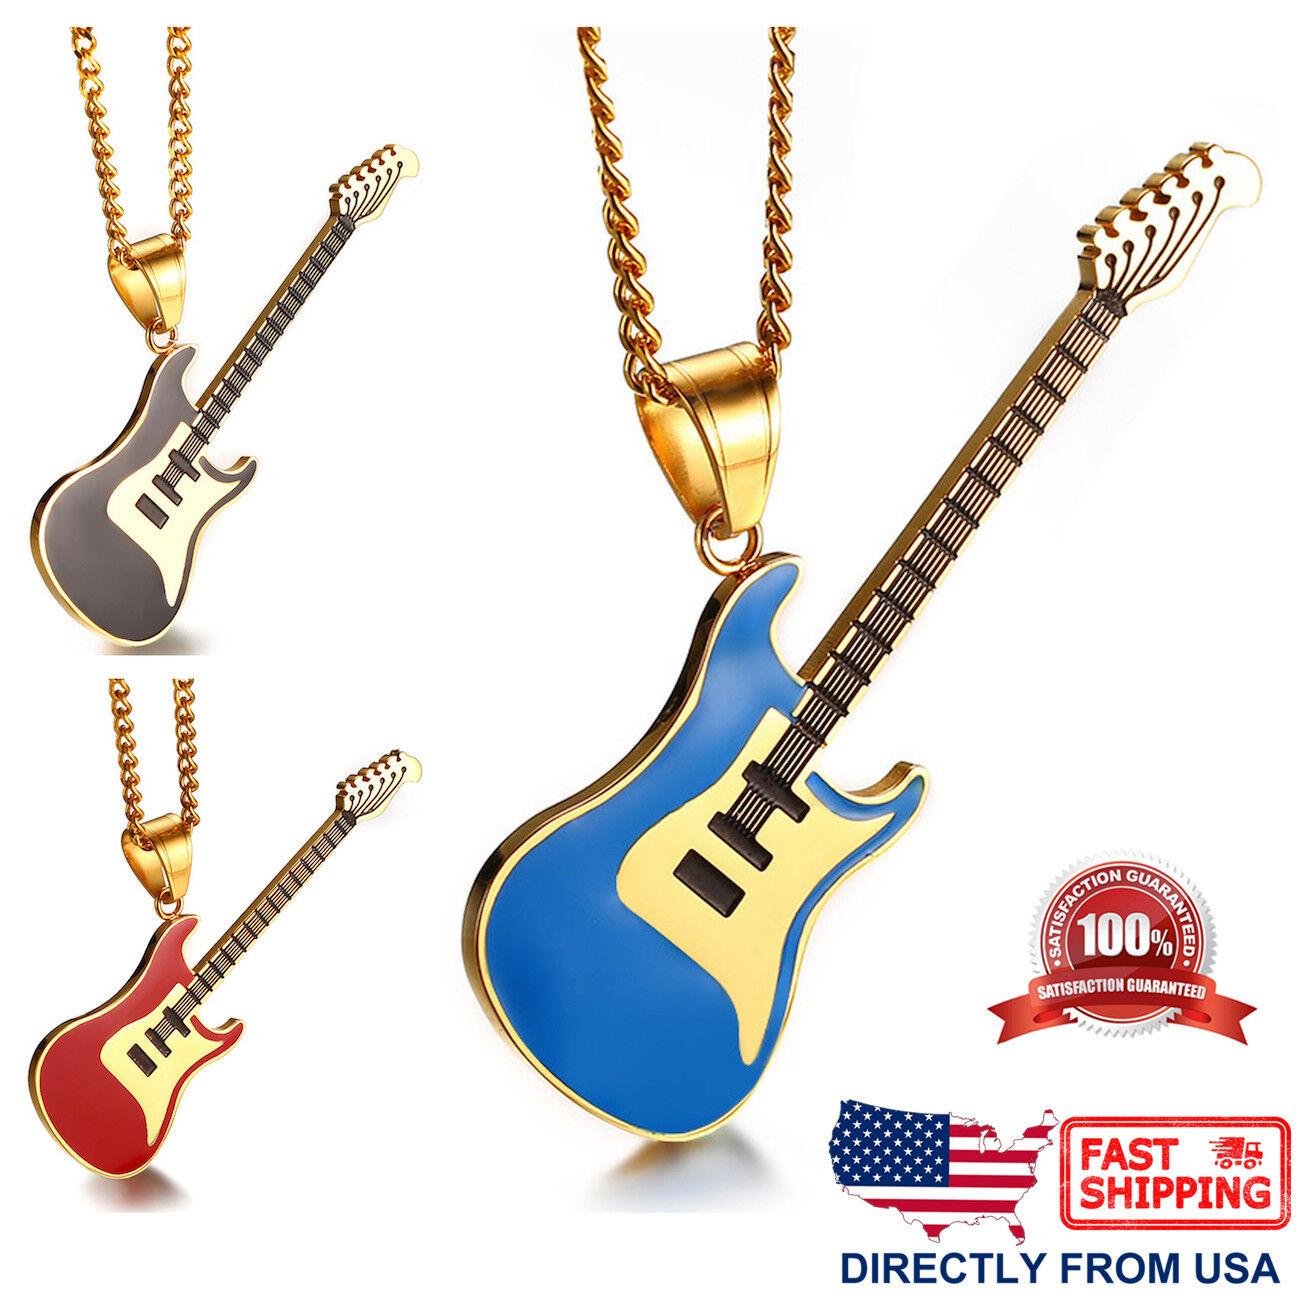 Men's Stainless Steel Gold Color Guitar Pendant Necklace Chains, Necklaces & Pendants